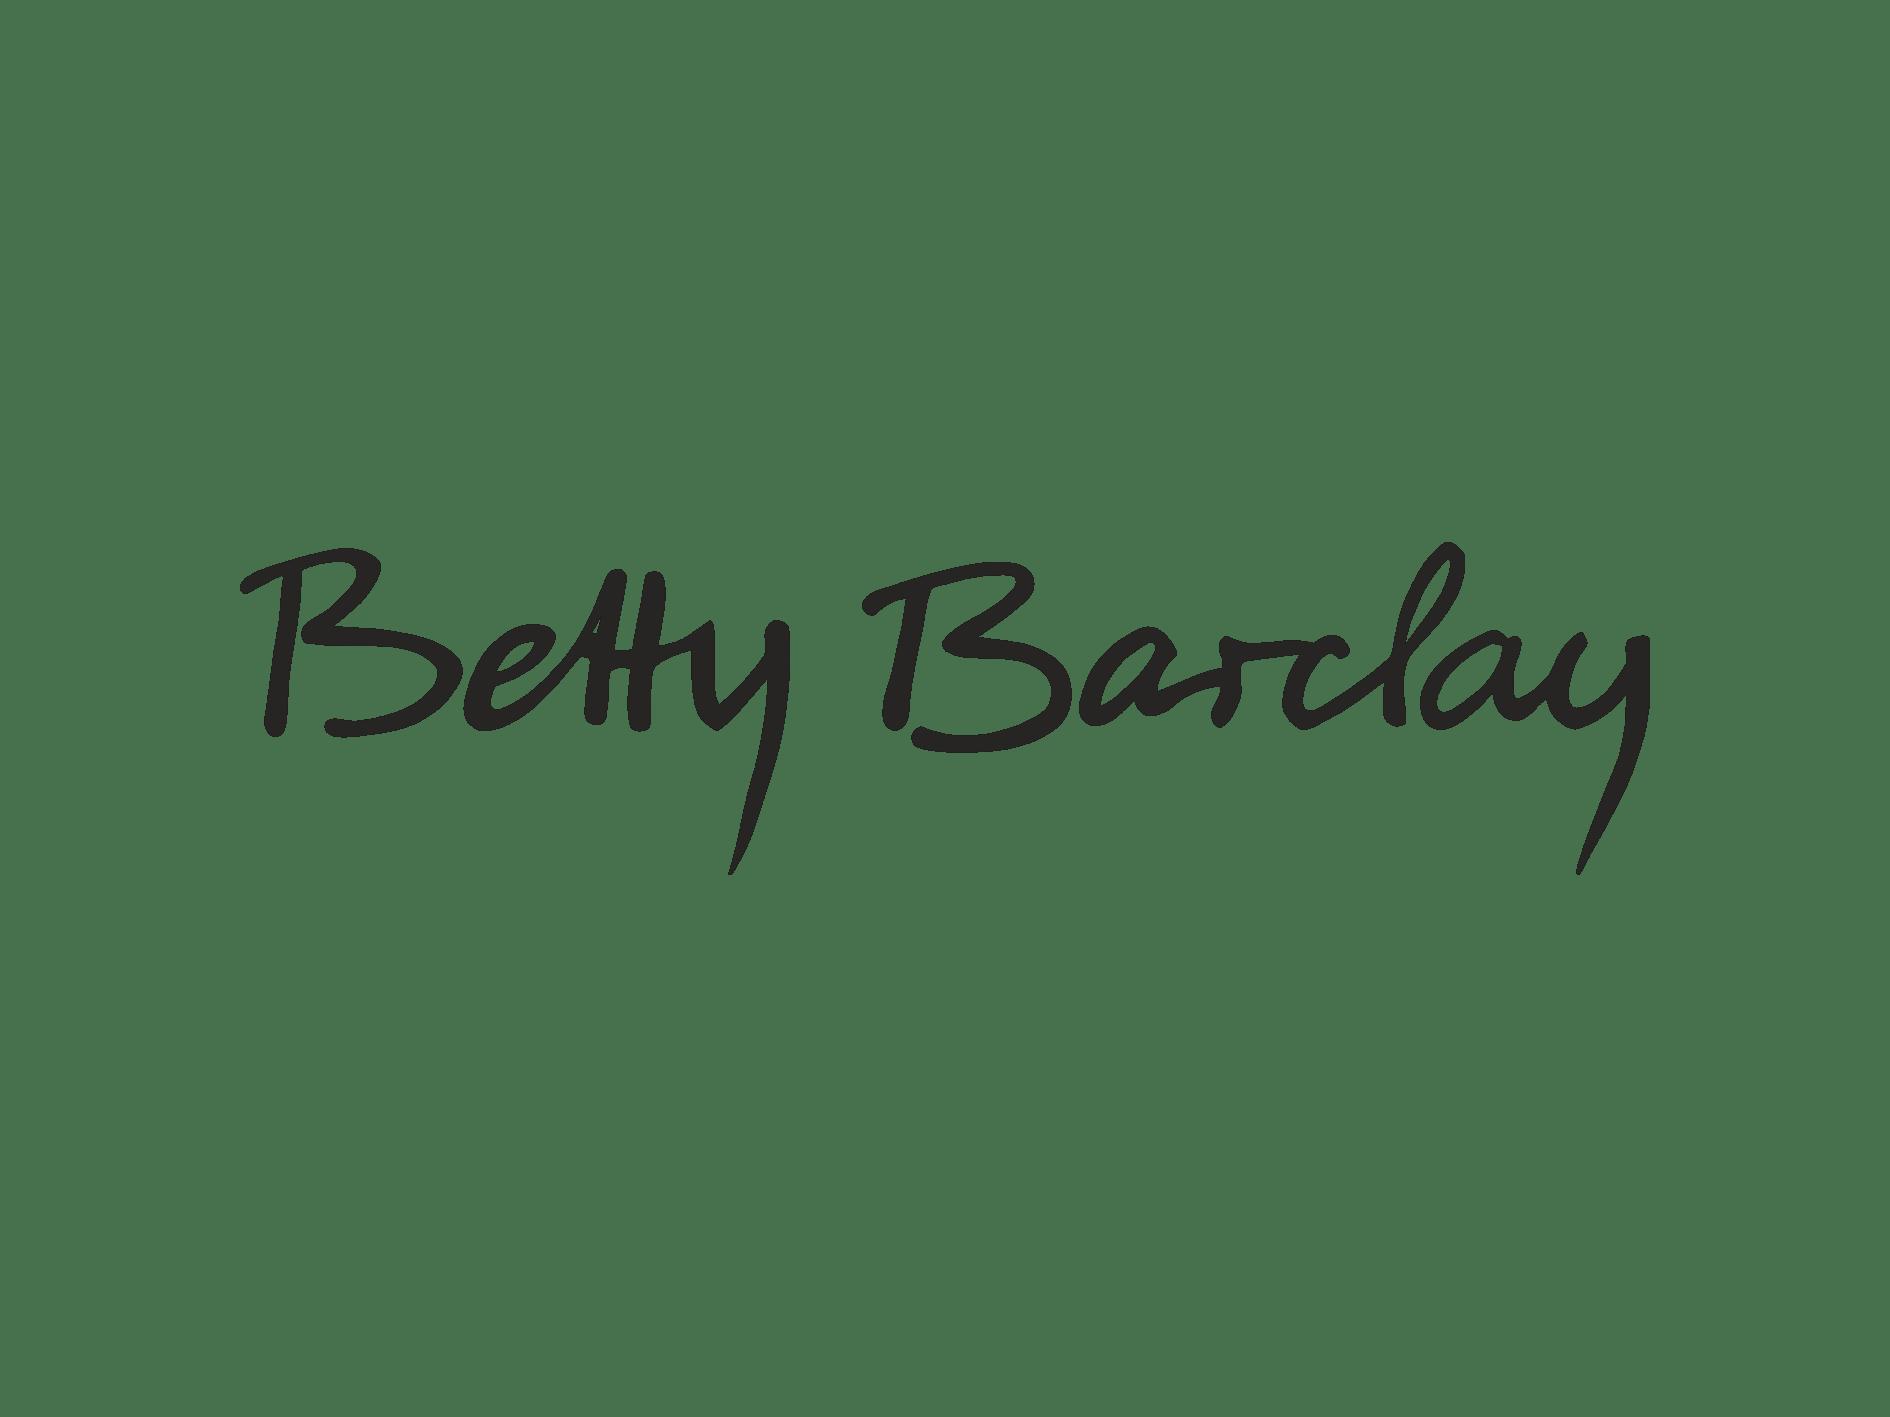 BETTY BARCLAY  - kiev.karavan.com.ua